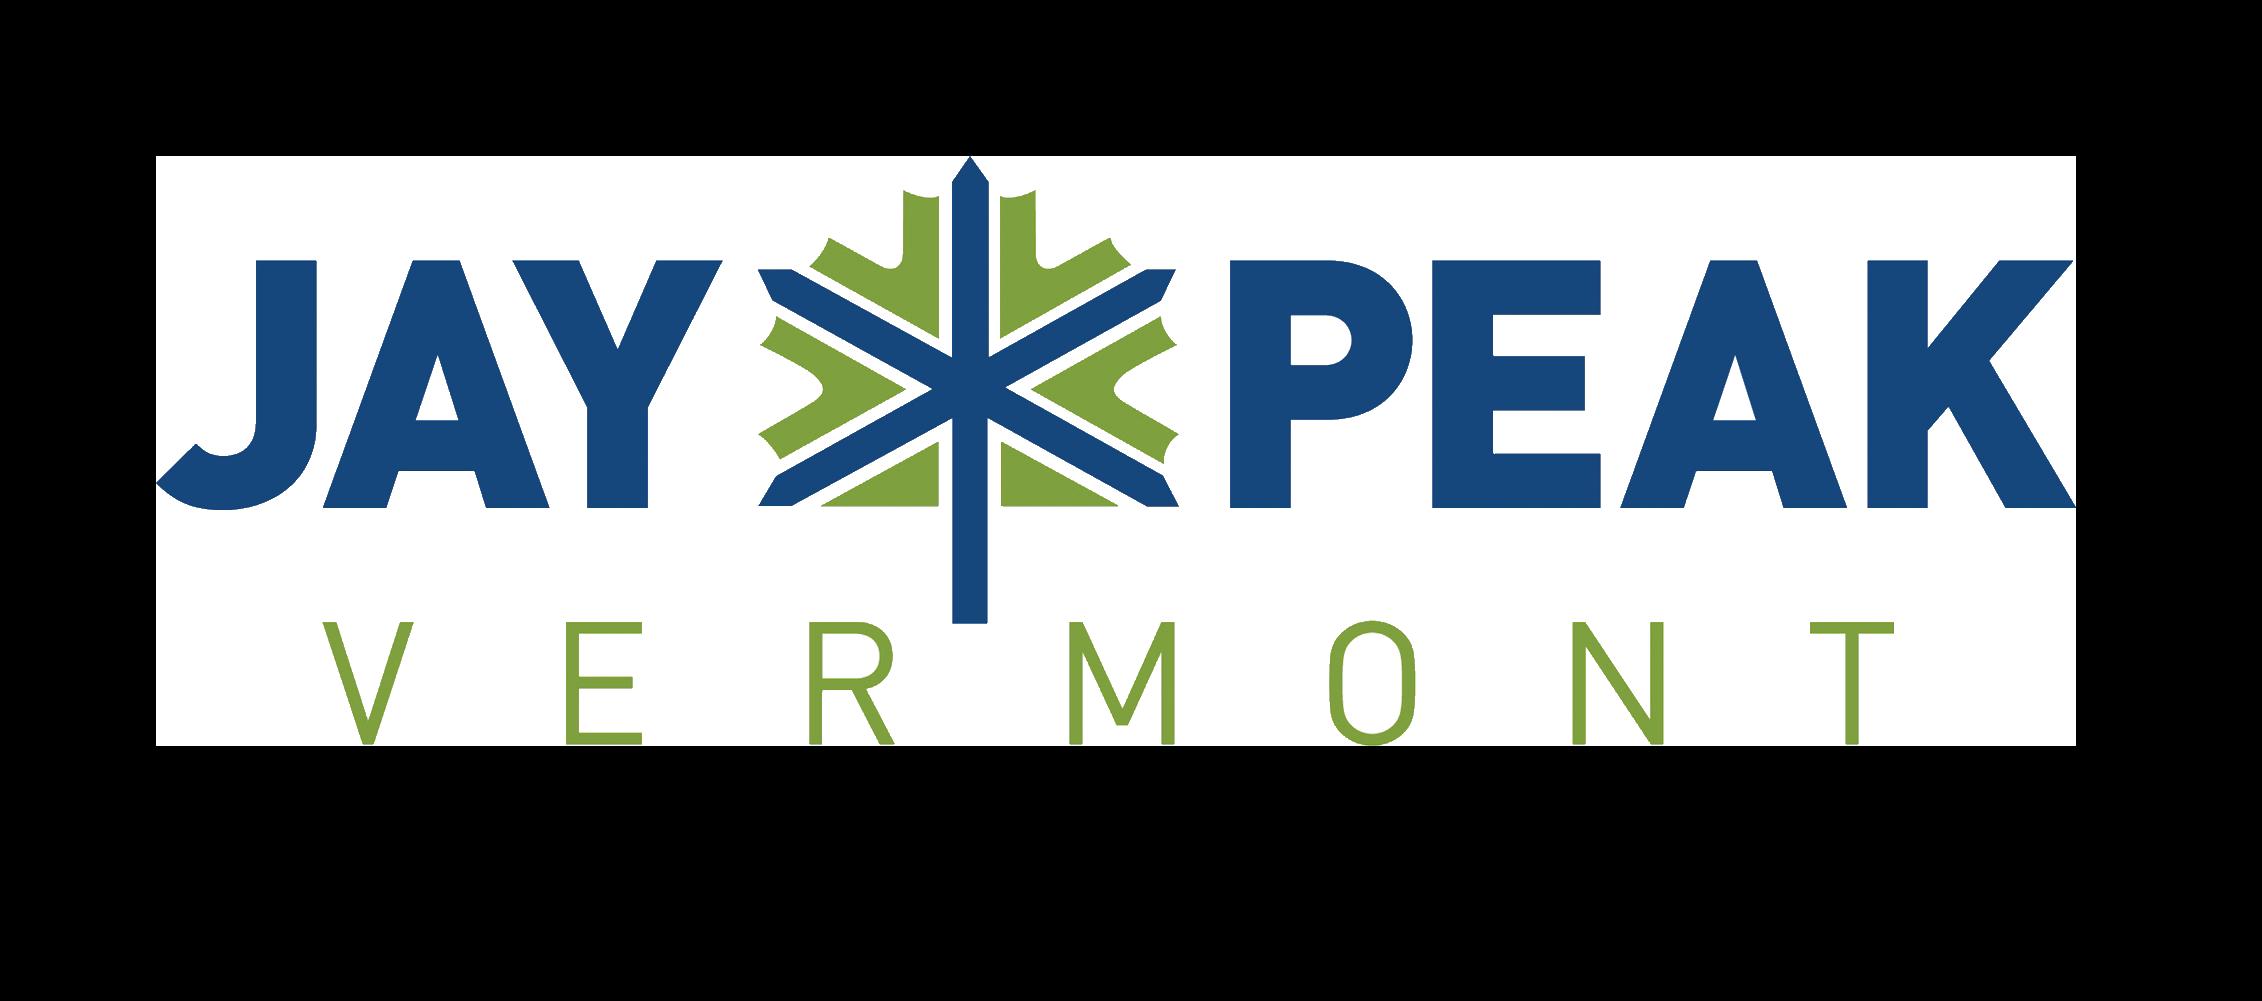 Jay_Peak_Resort_Logo.png